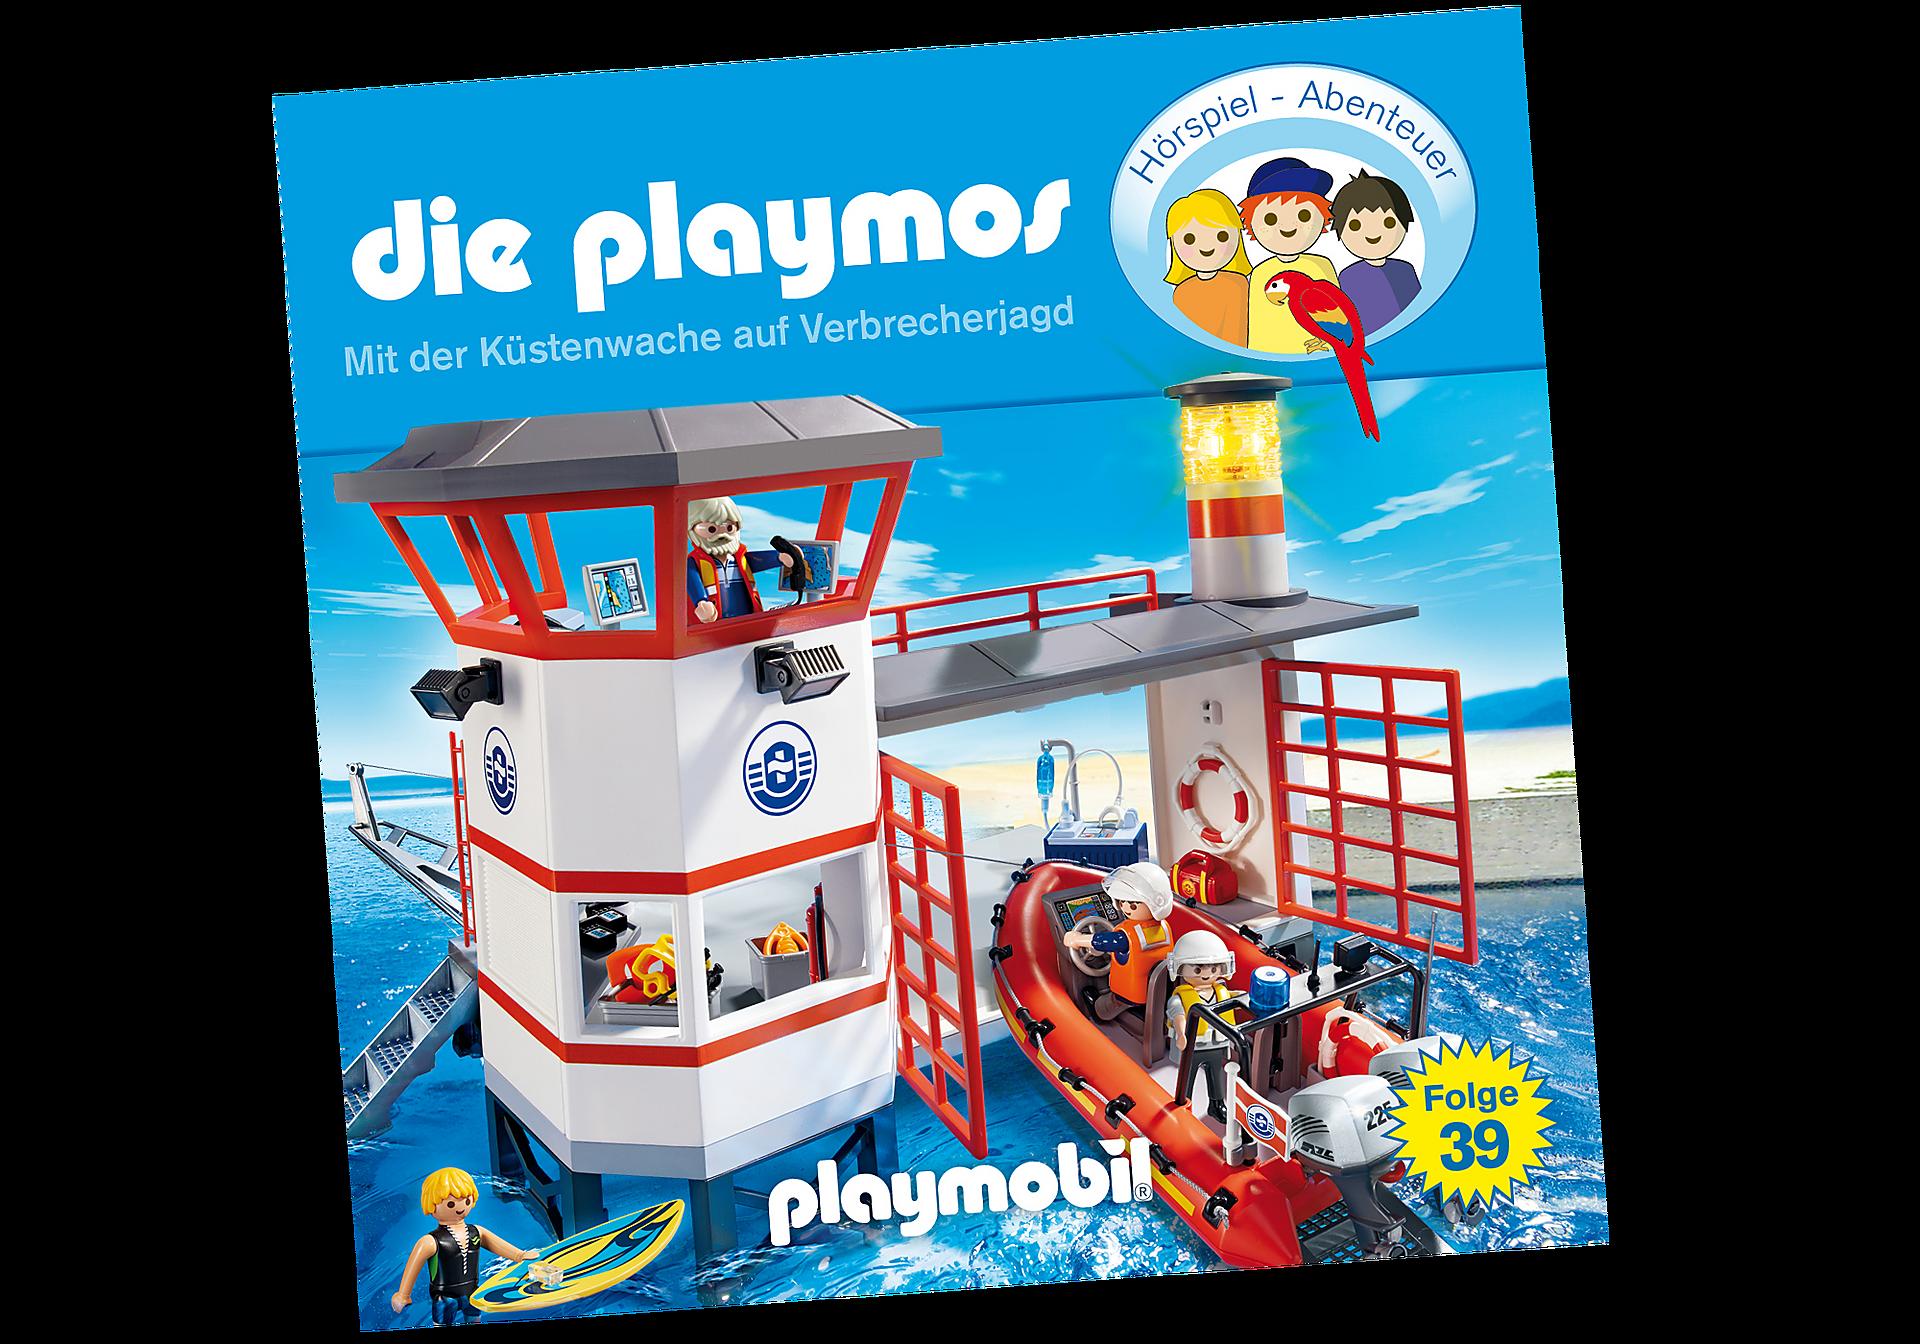 http://media.playmobil.com/i/playmobil/80452_product_detail/Einsatz für die Küstenwache (39) - CD